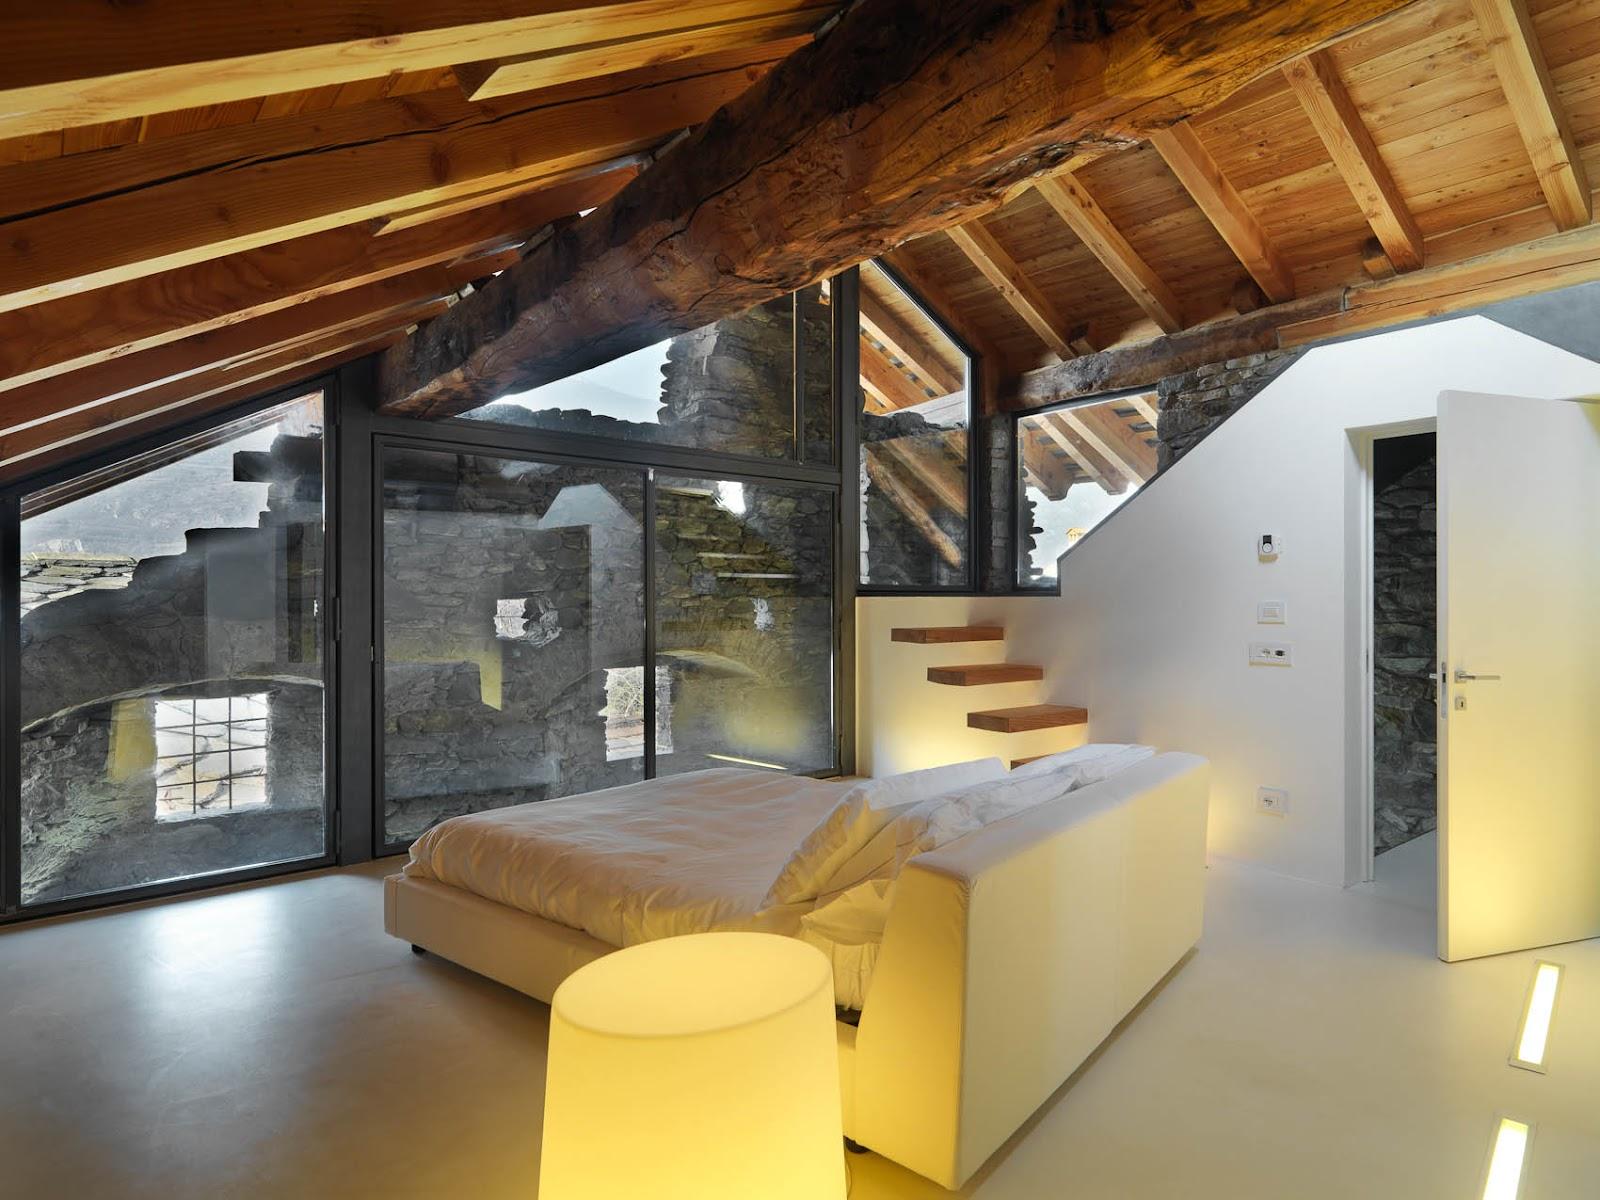 Neo arquitecturaymas espectaculares interiores en madera - Interiores de piedra ...